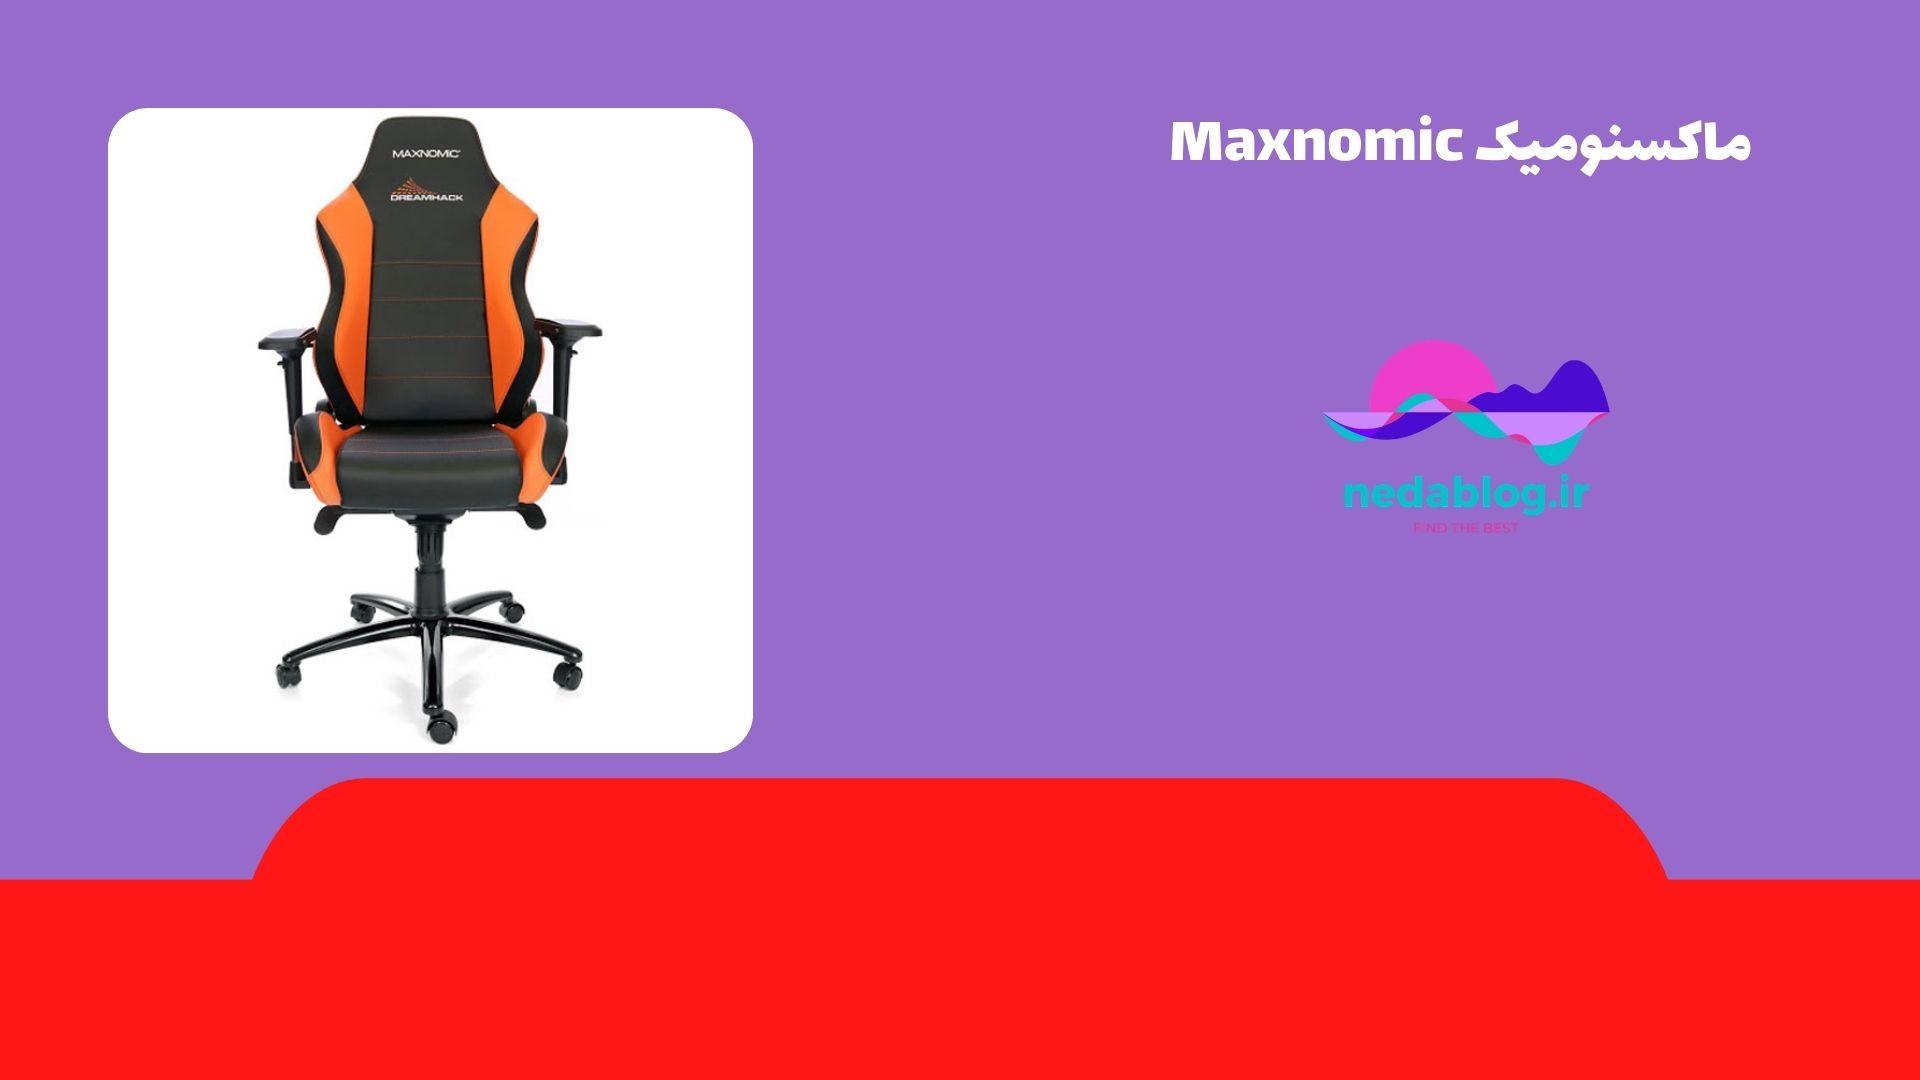 ماکسنومیک Maxnomic